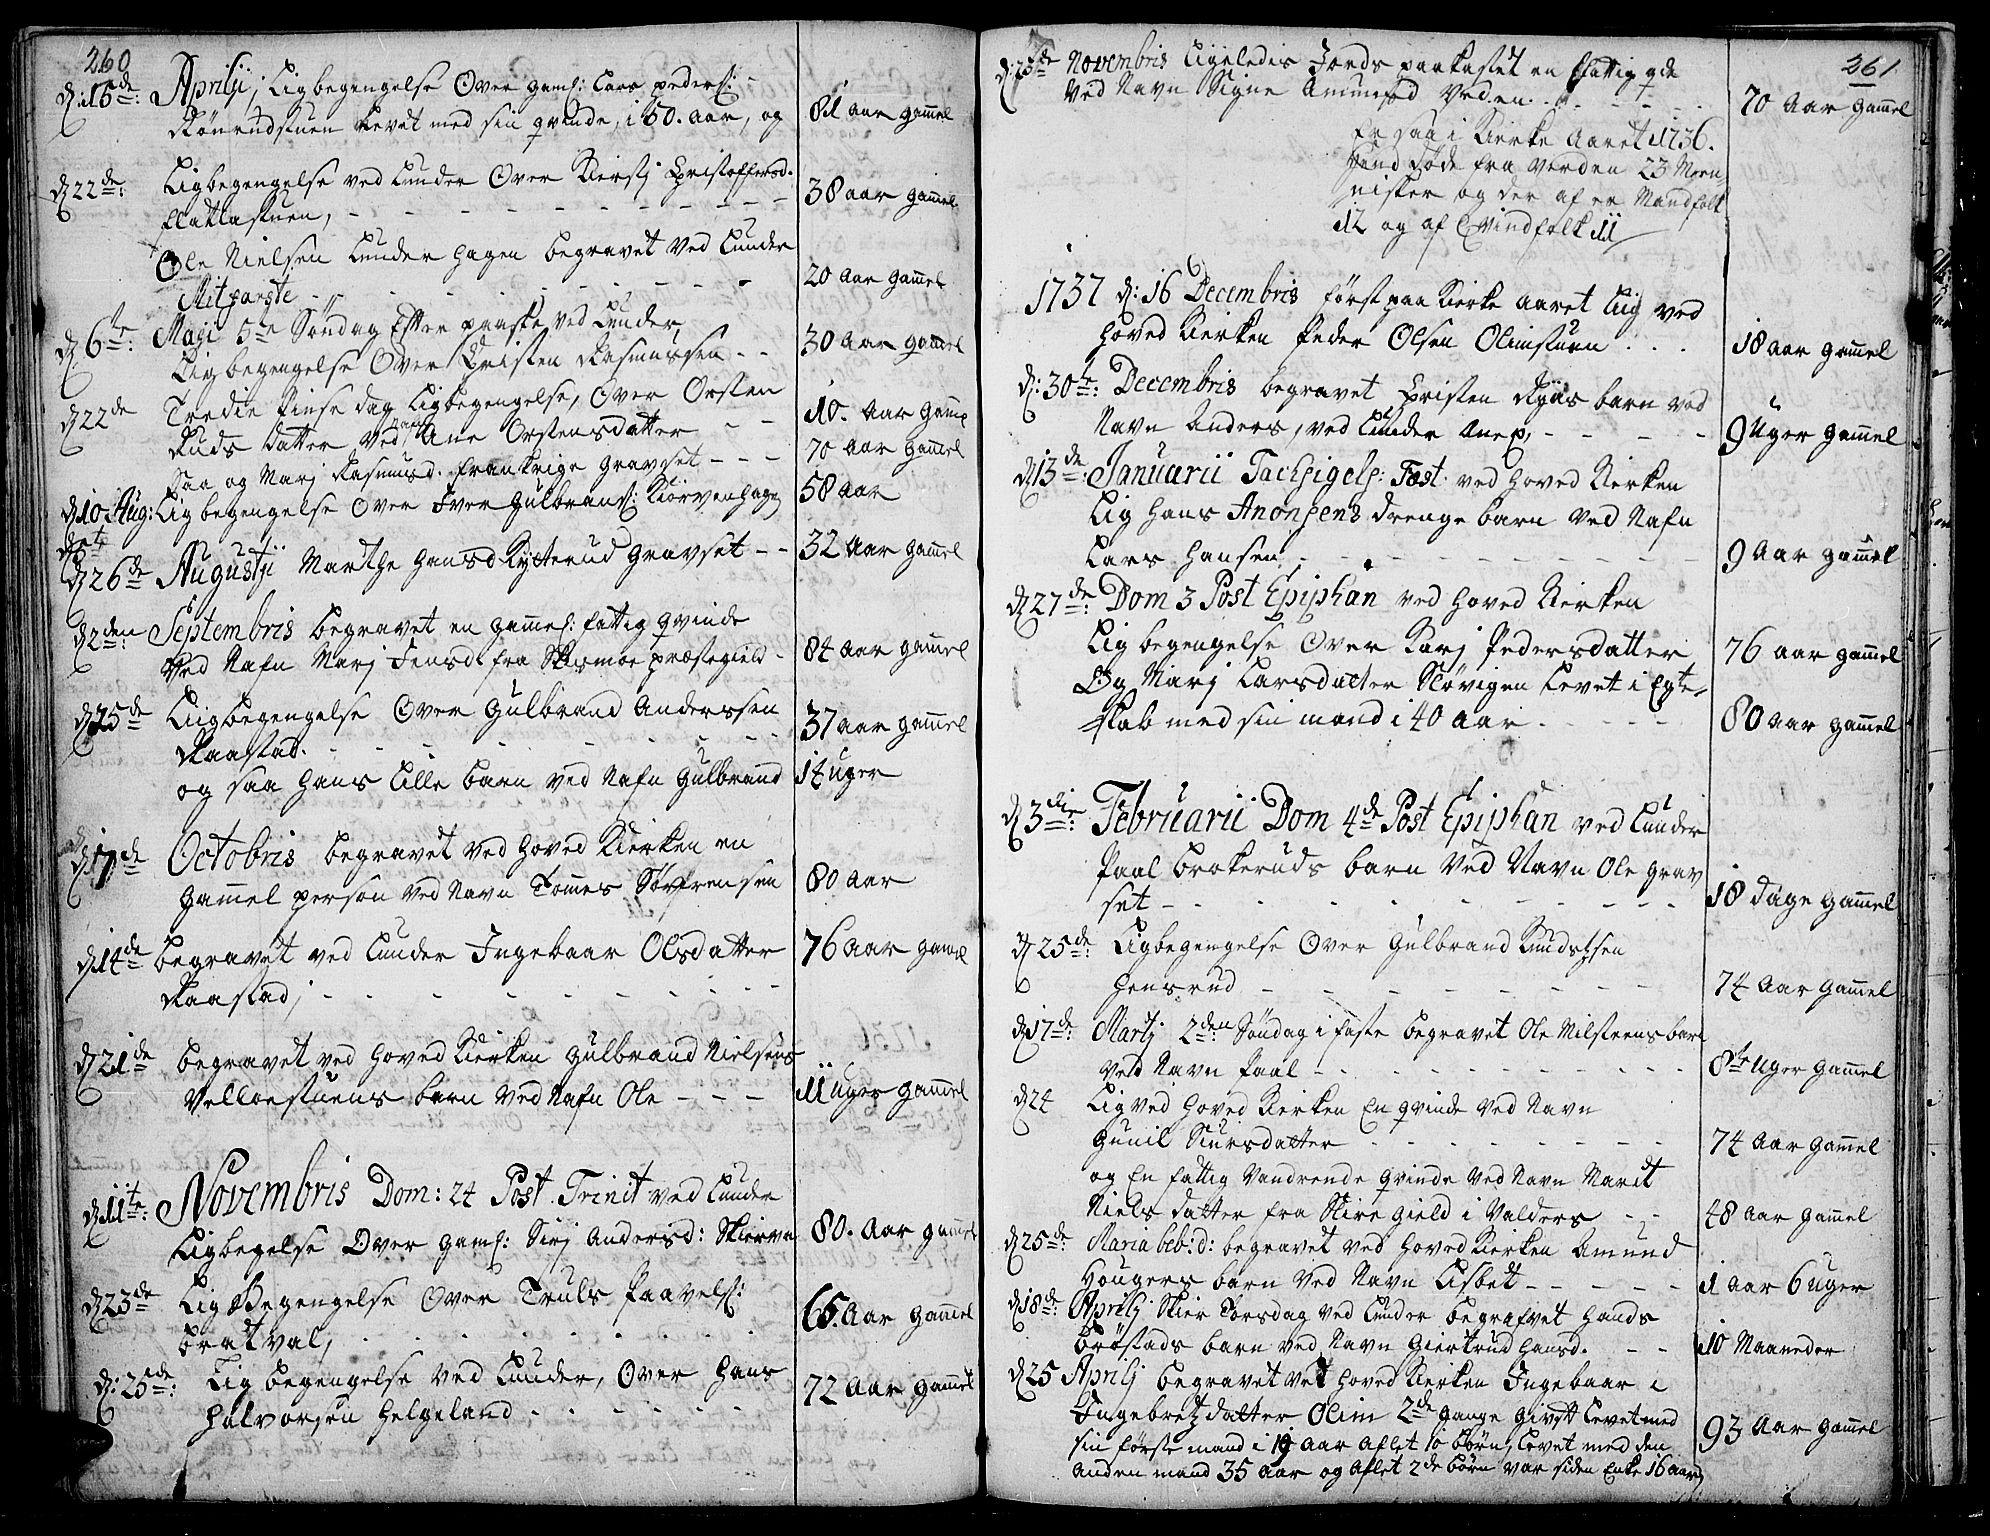 SAH, Jevnaker prestekontor, Ministerialbok nr. 2, 1725-1751, s. 260-261